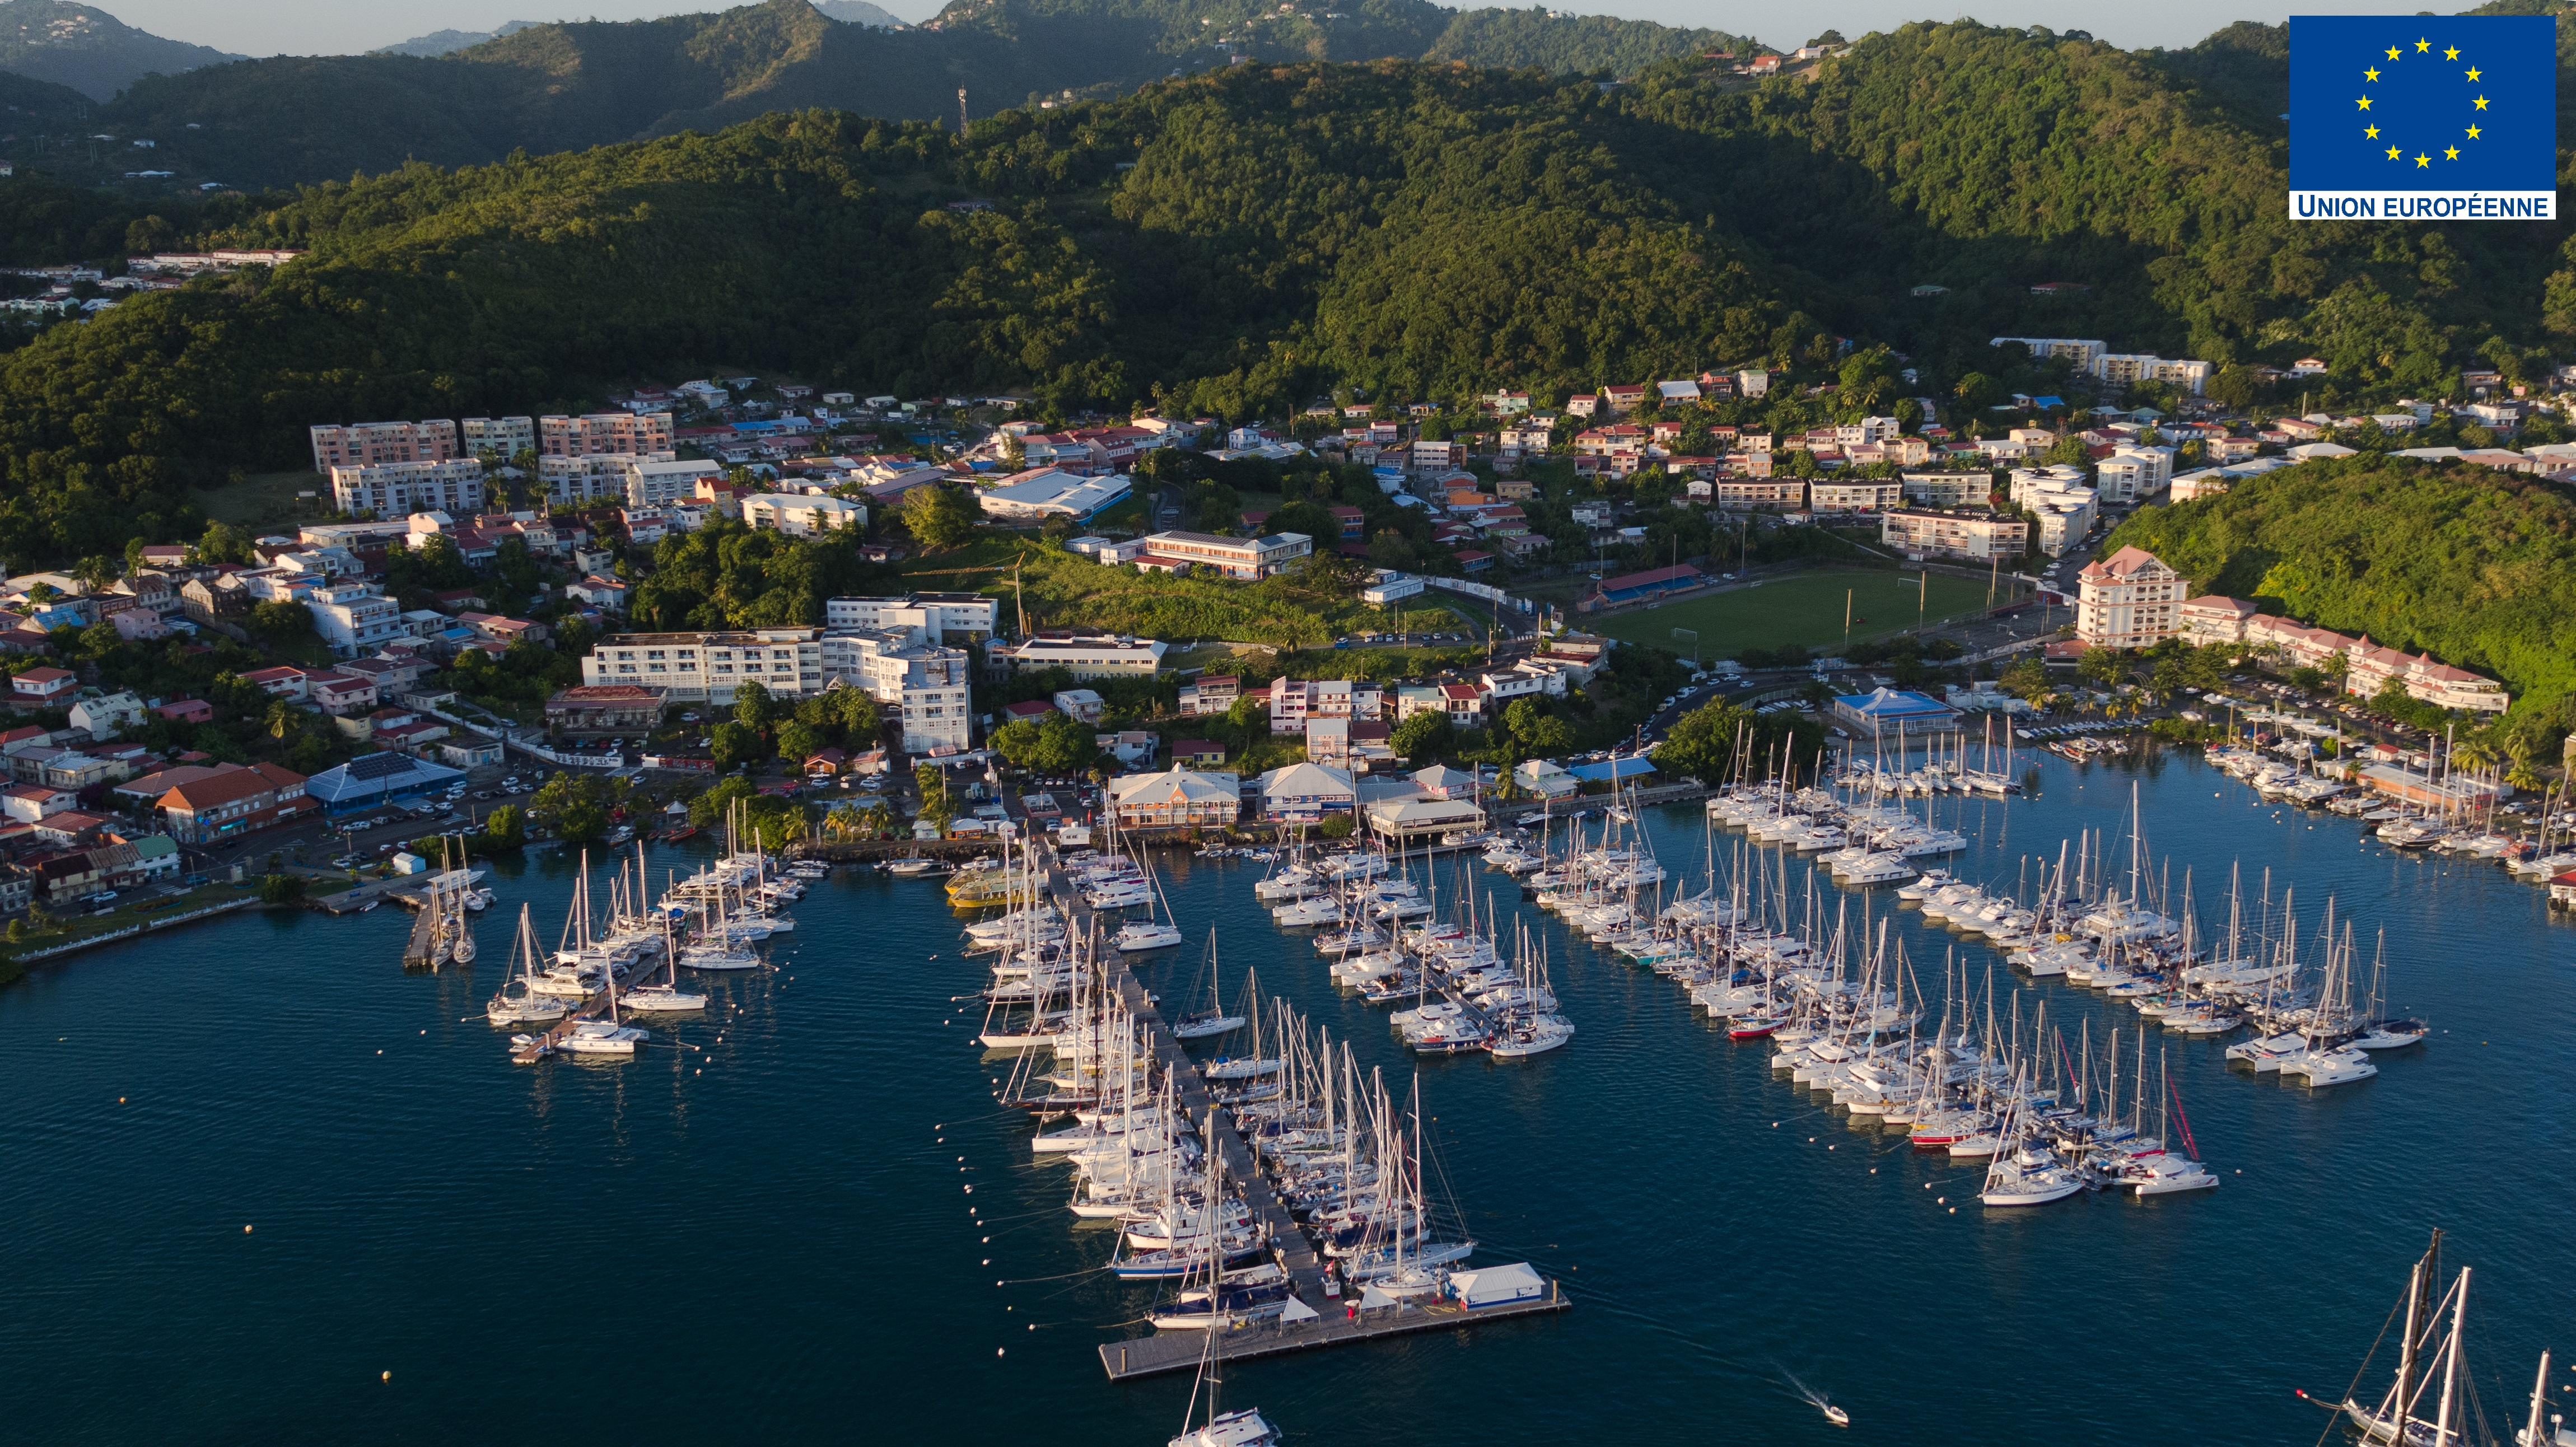 Marina du Marin - Port de Plaisance de la Martinique